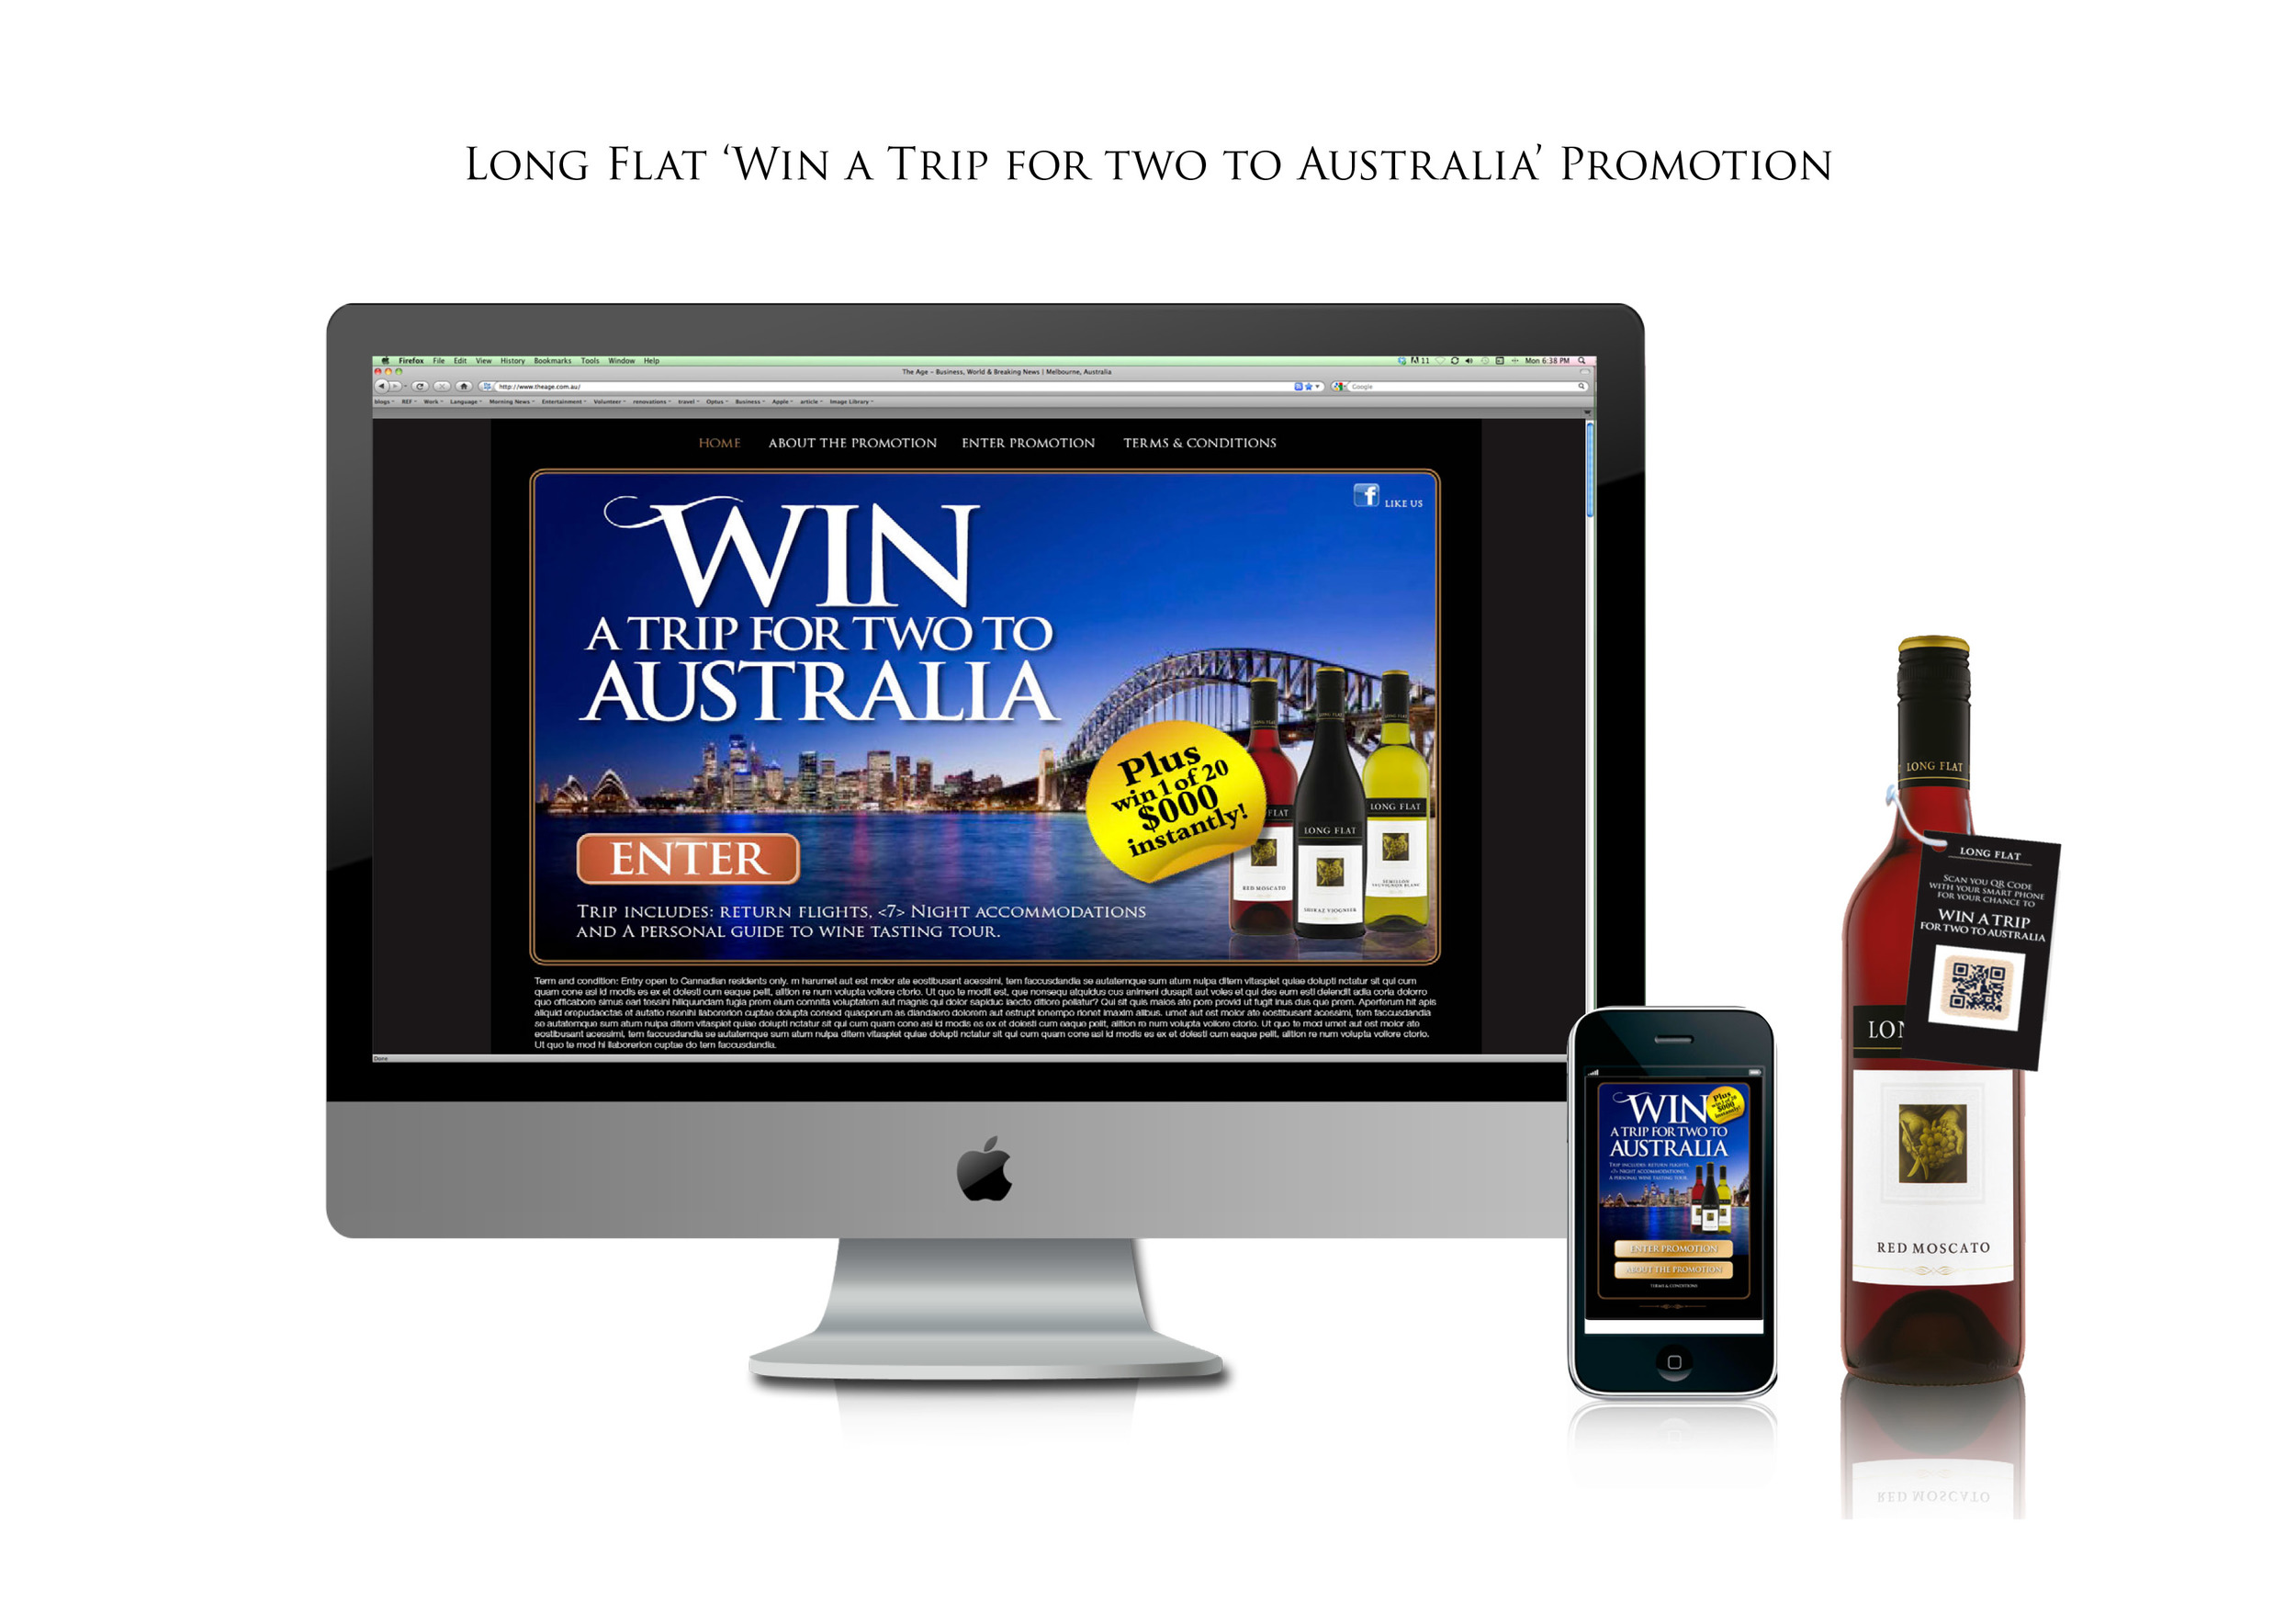 LongFlat Competition Promo.jpg